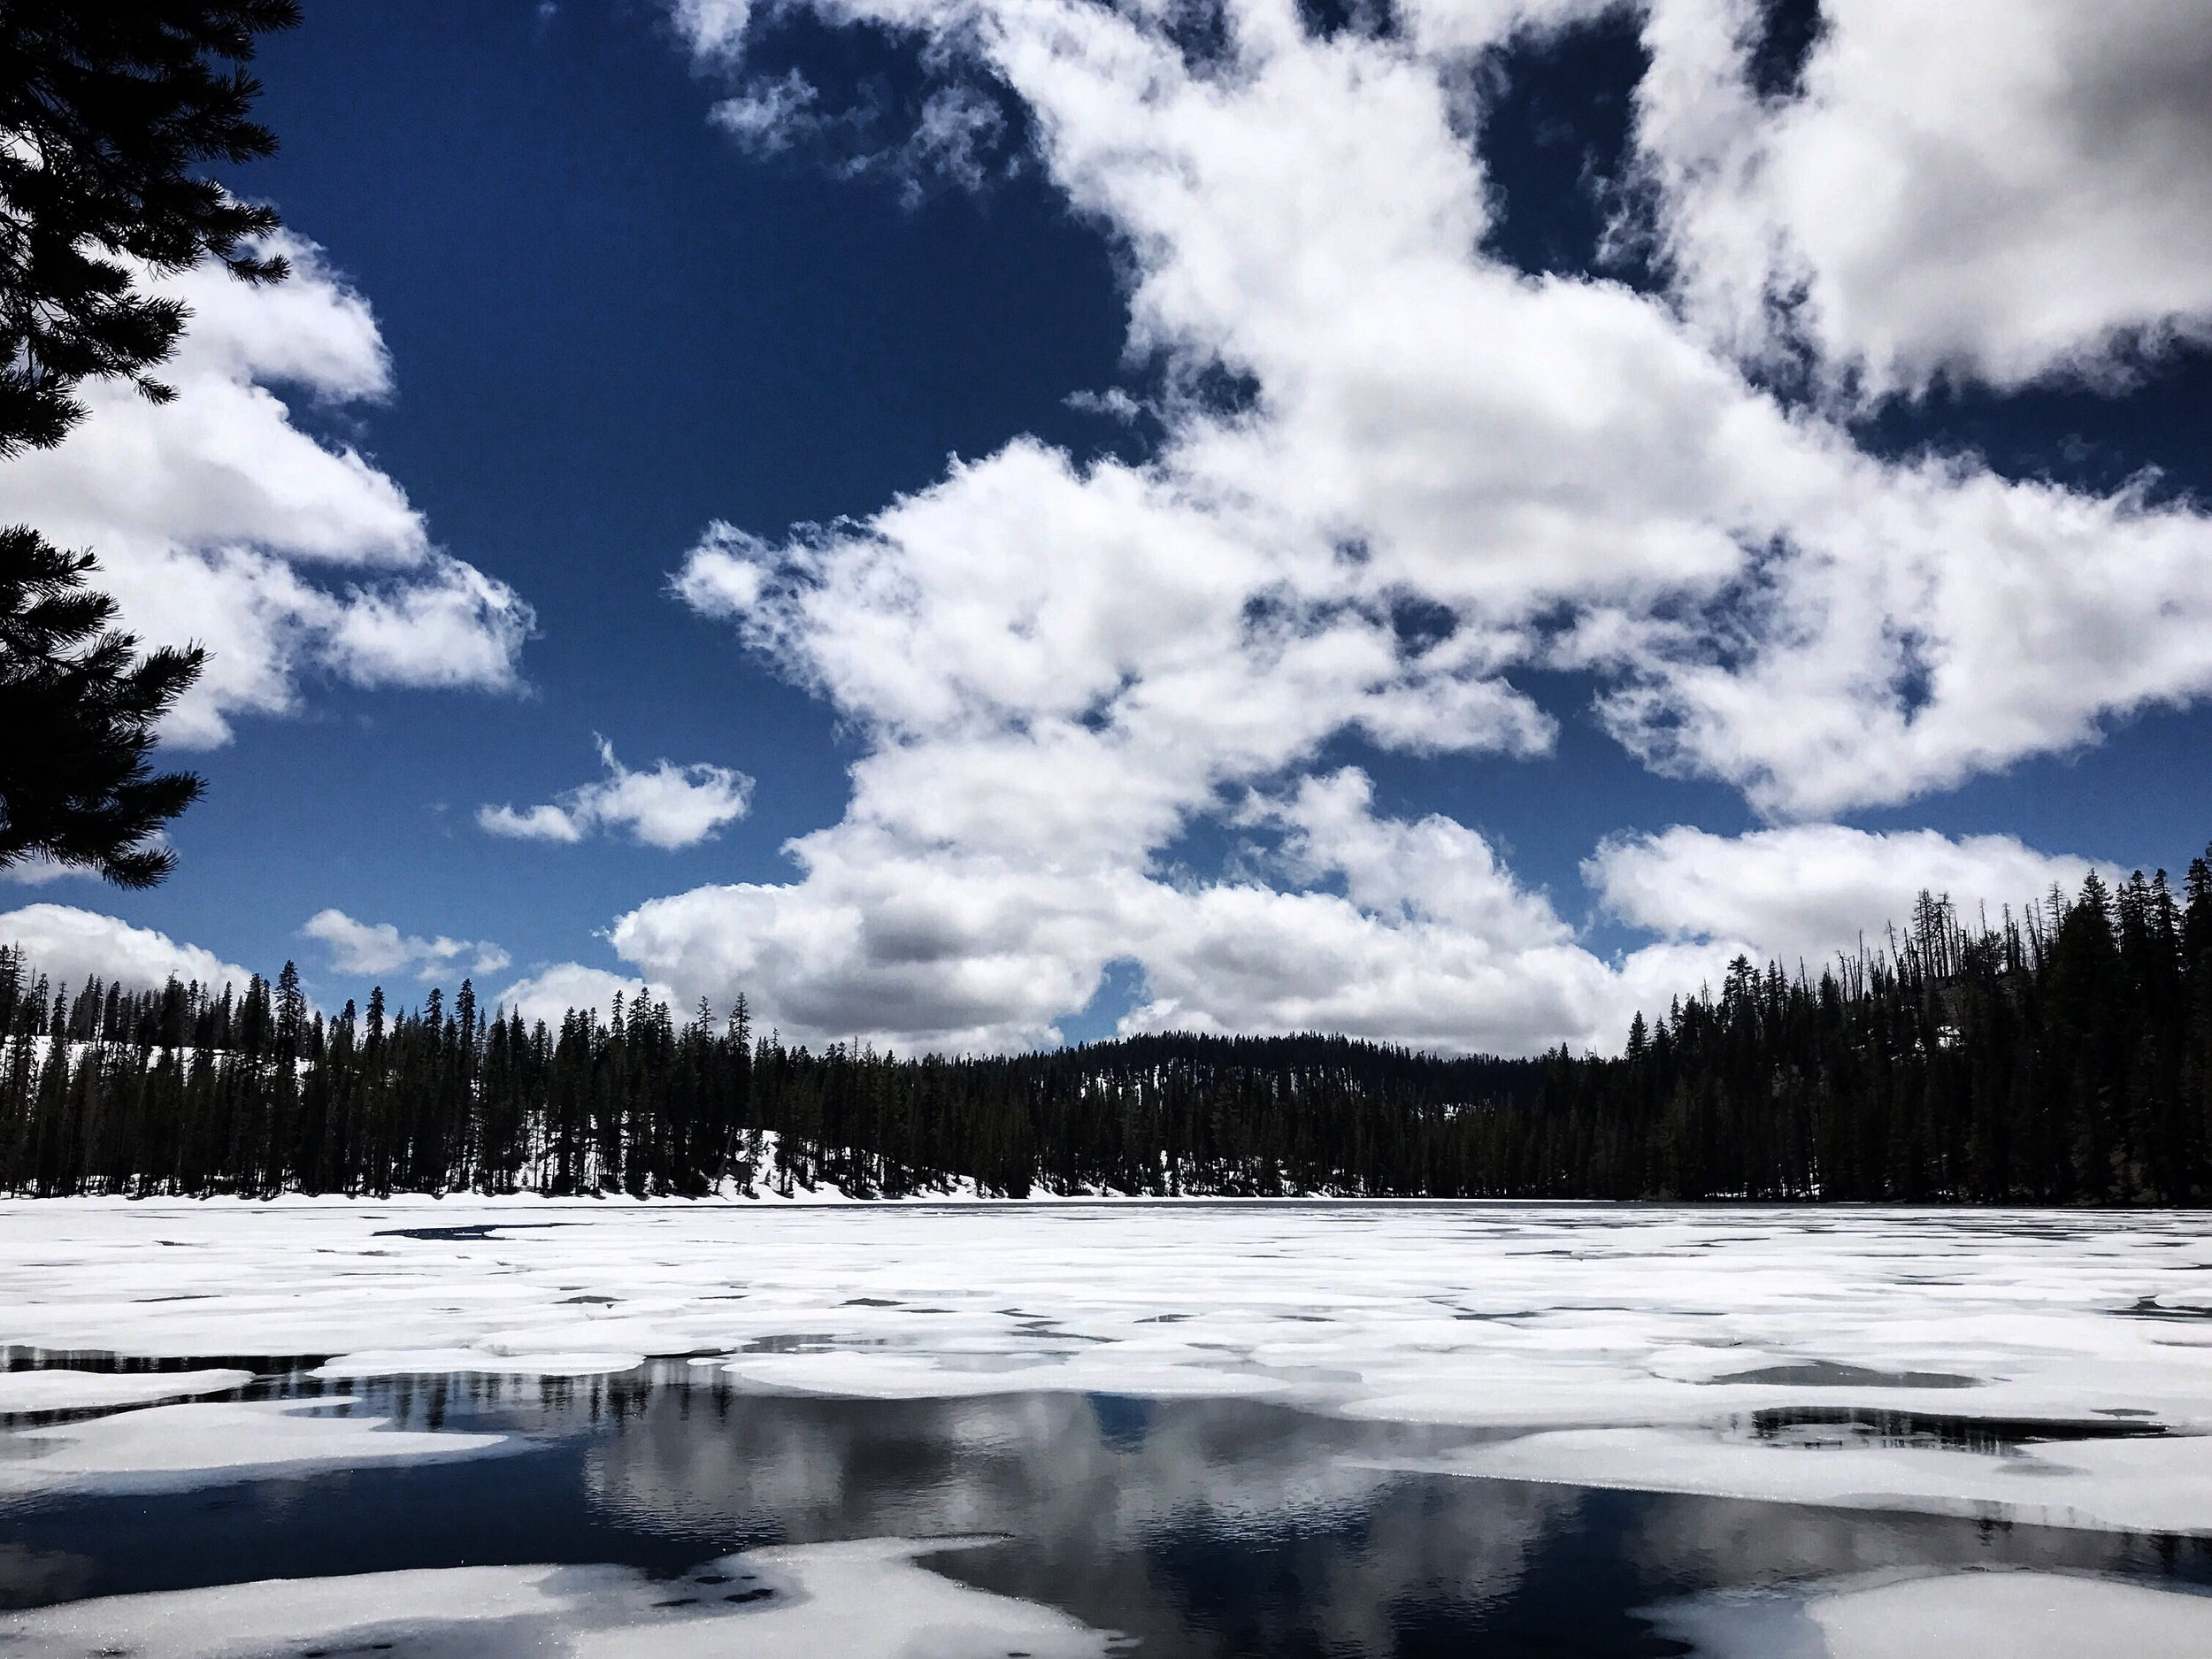 Lassen lakes are still thawing.